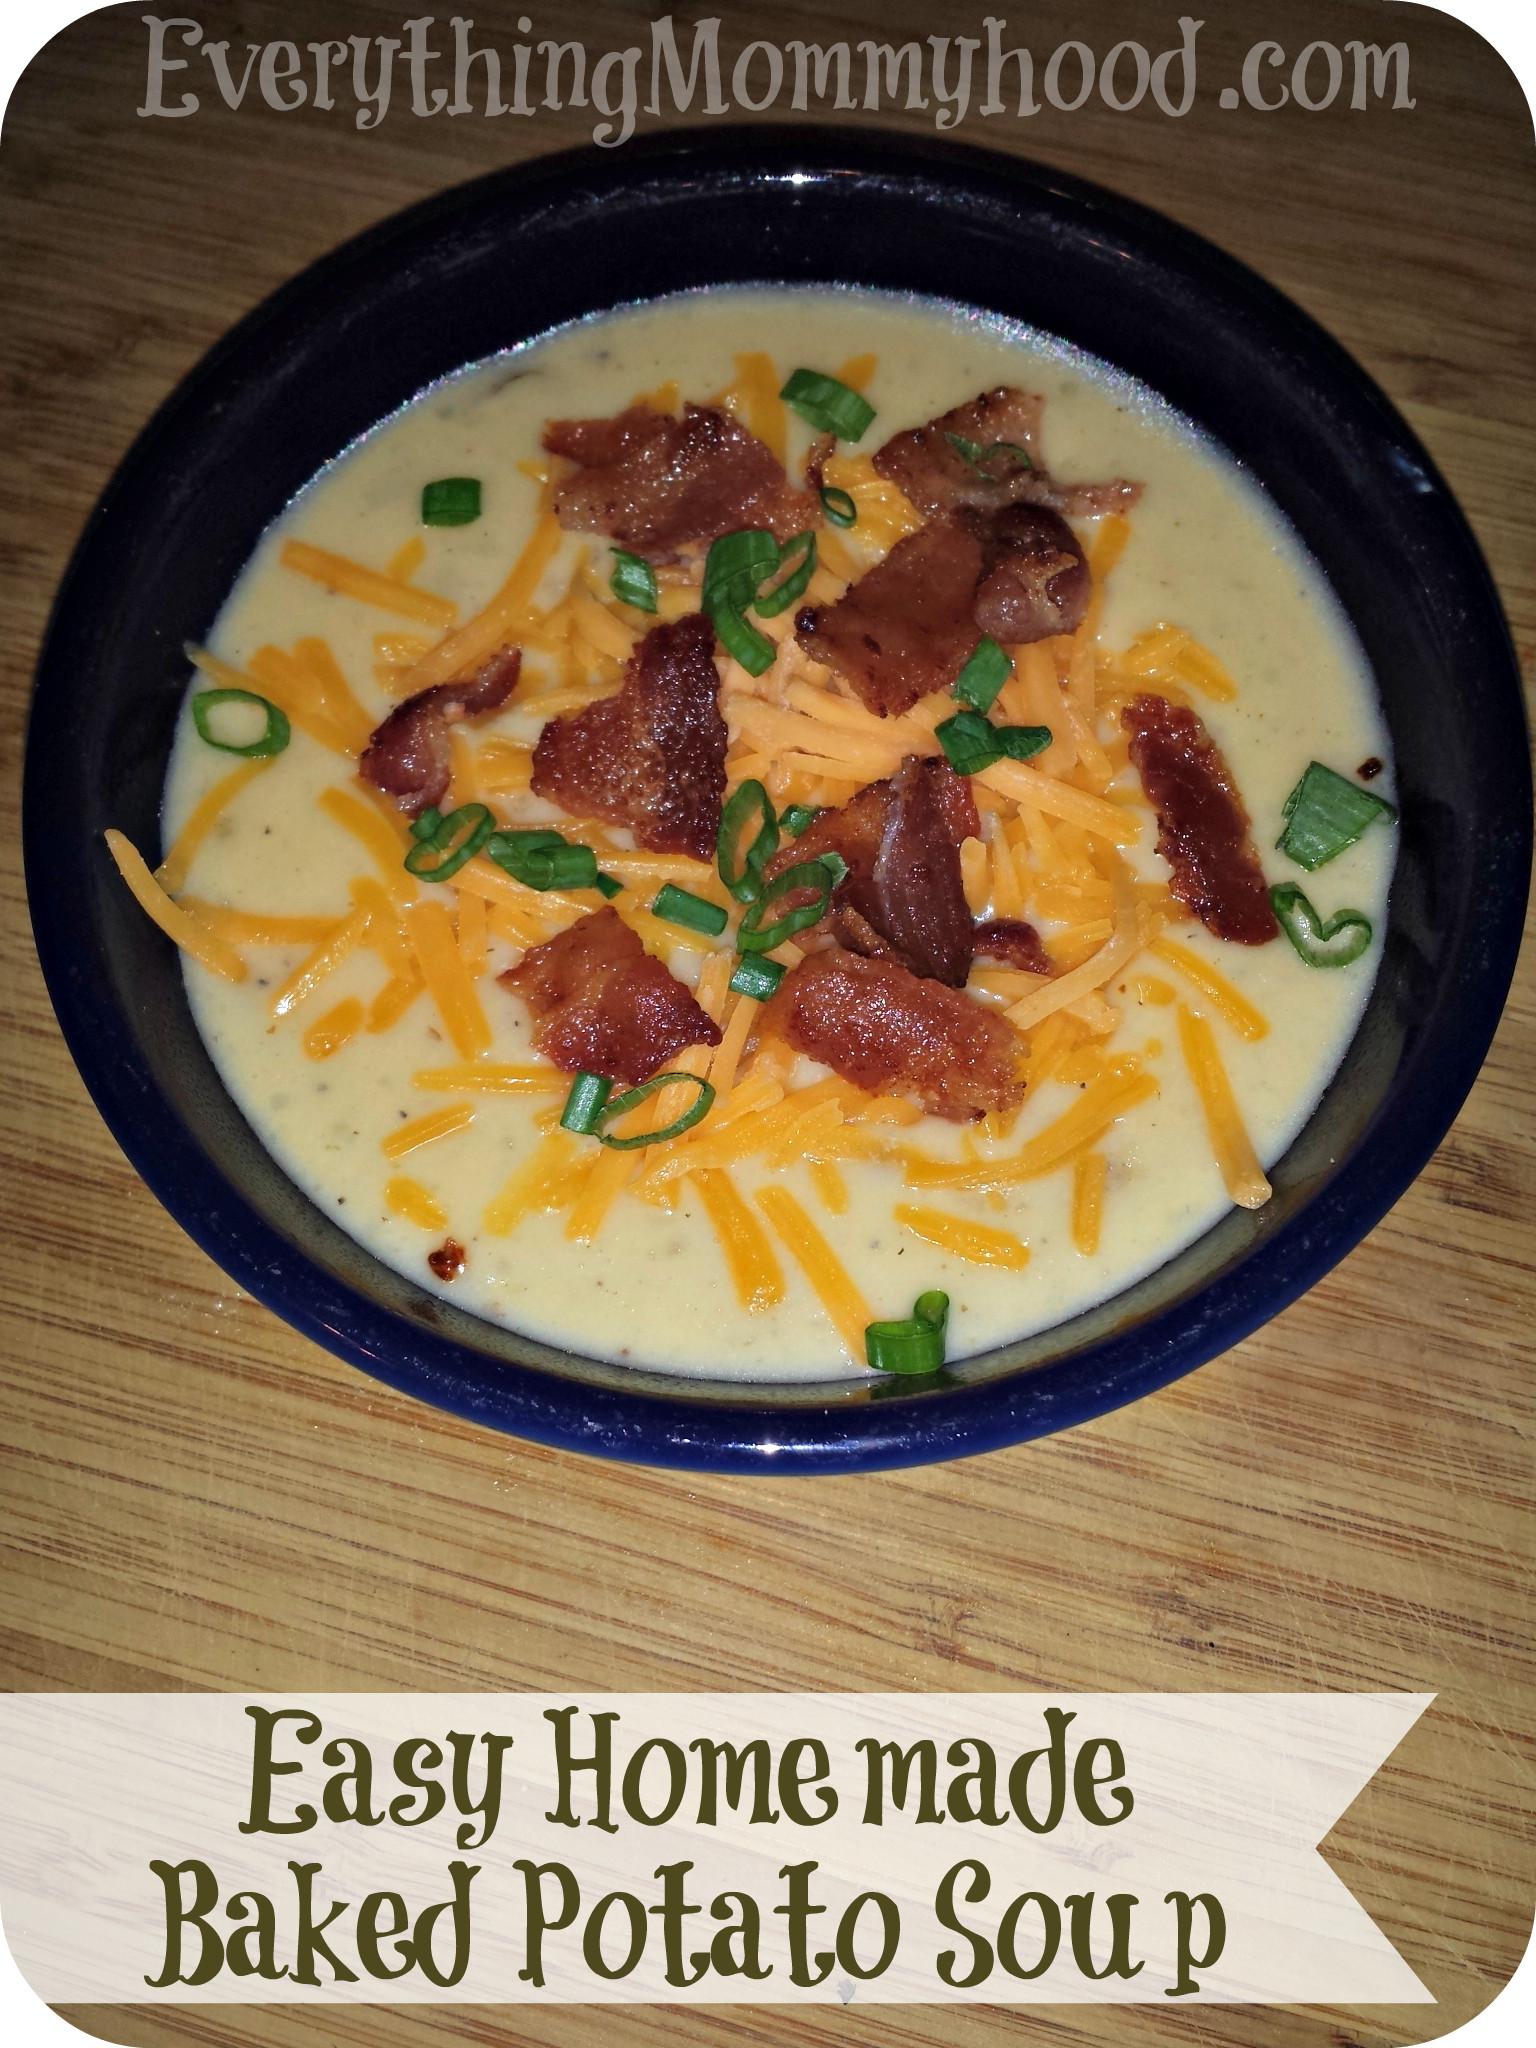 Easy Baked Potato Soup  Recipe Easy Homemade Baked Potato Soup Everything Mommyhood